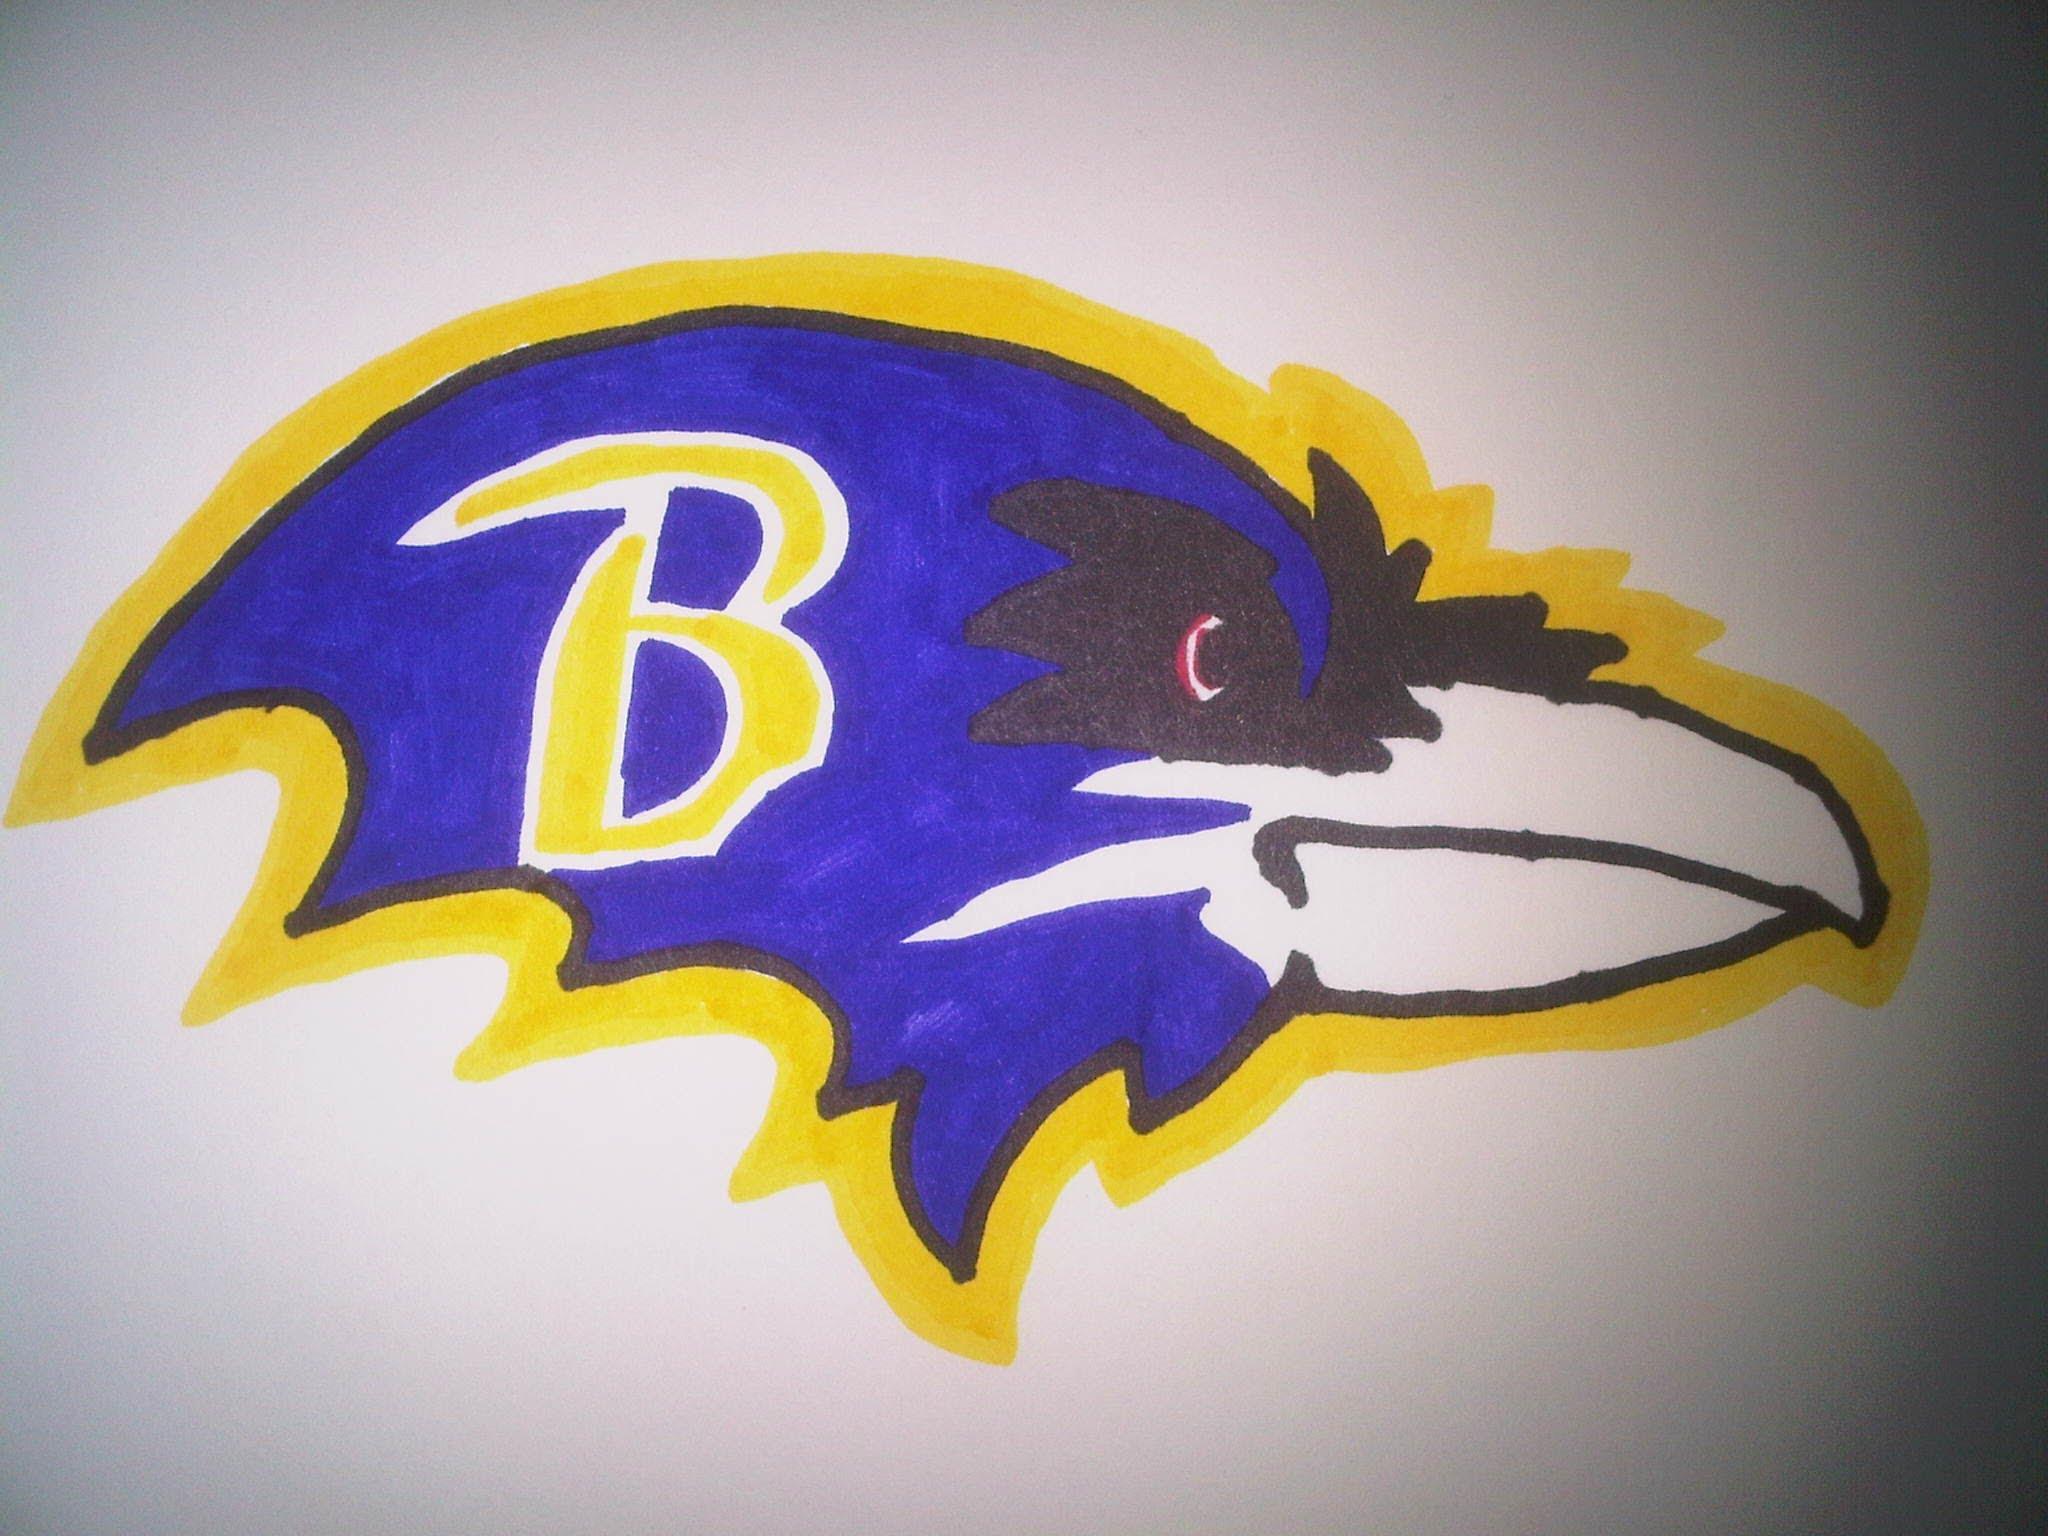 Drawn raven sketch Baltimore YouTube  to logo